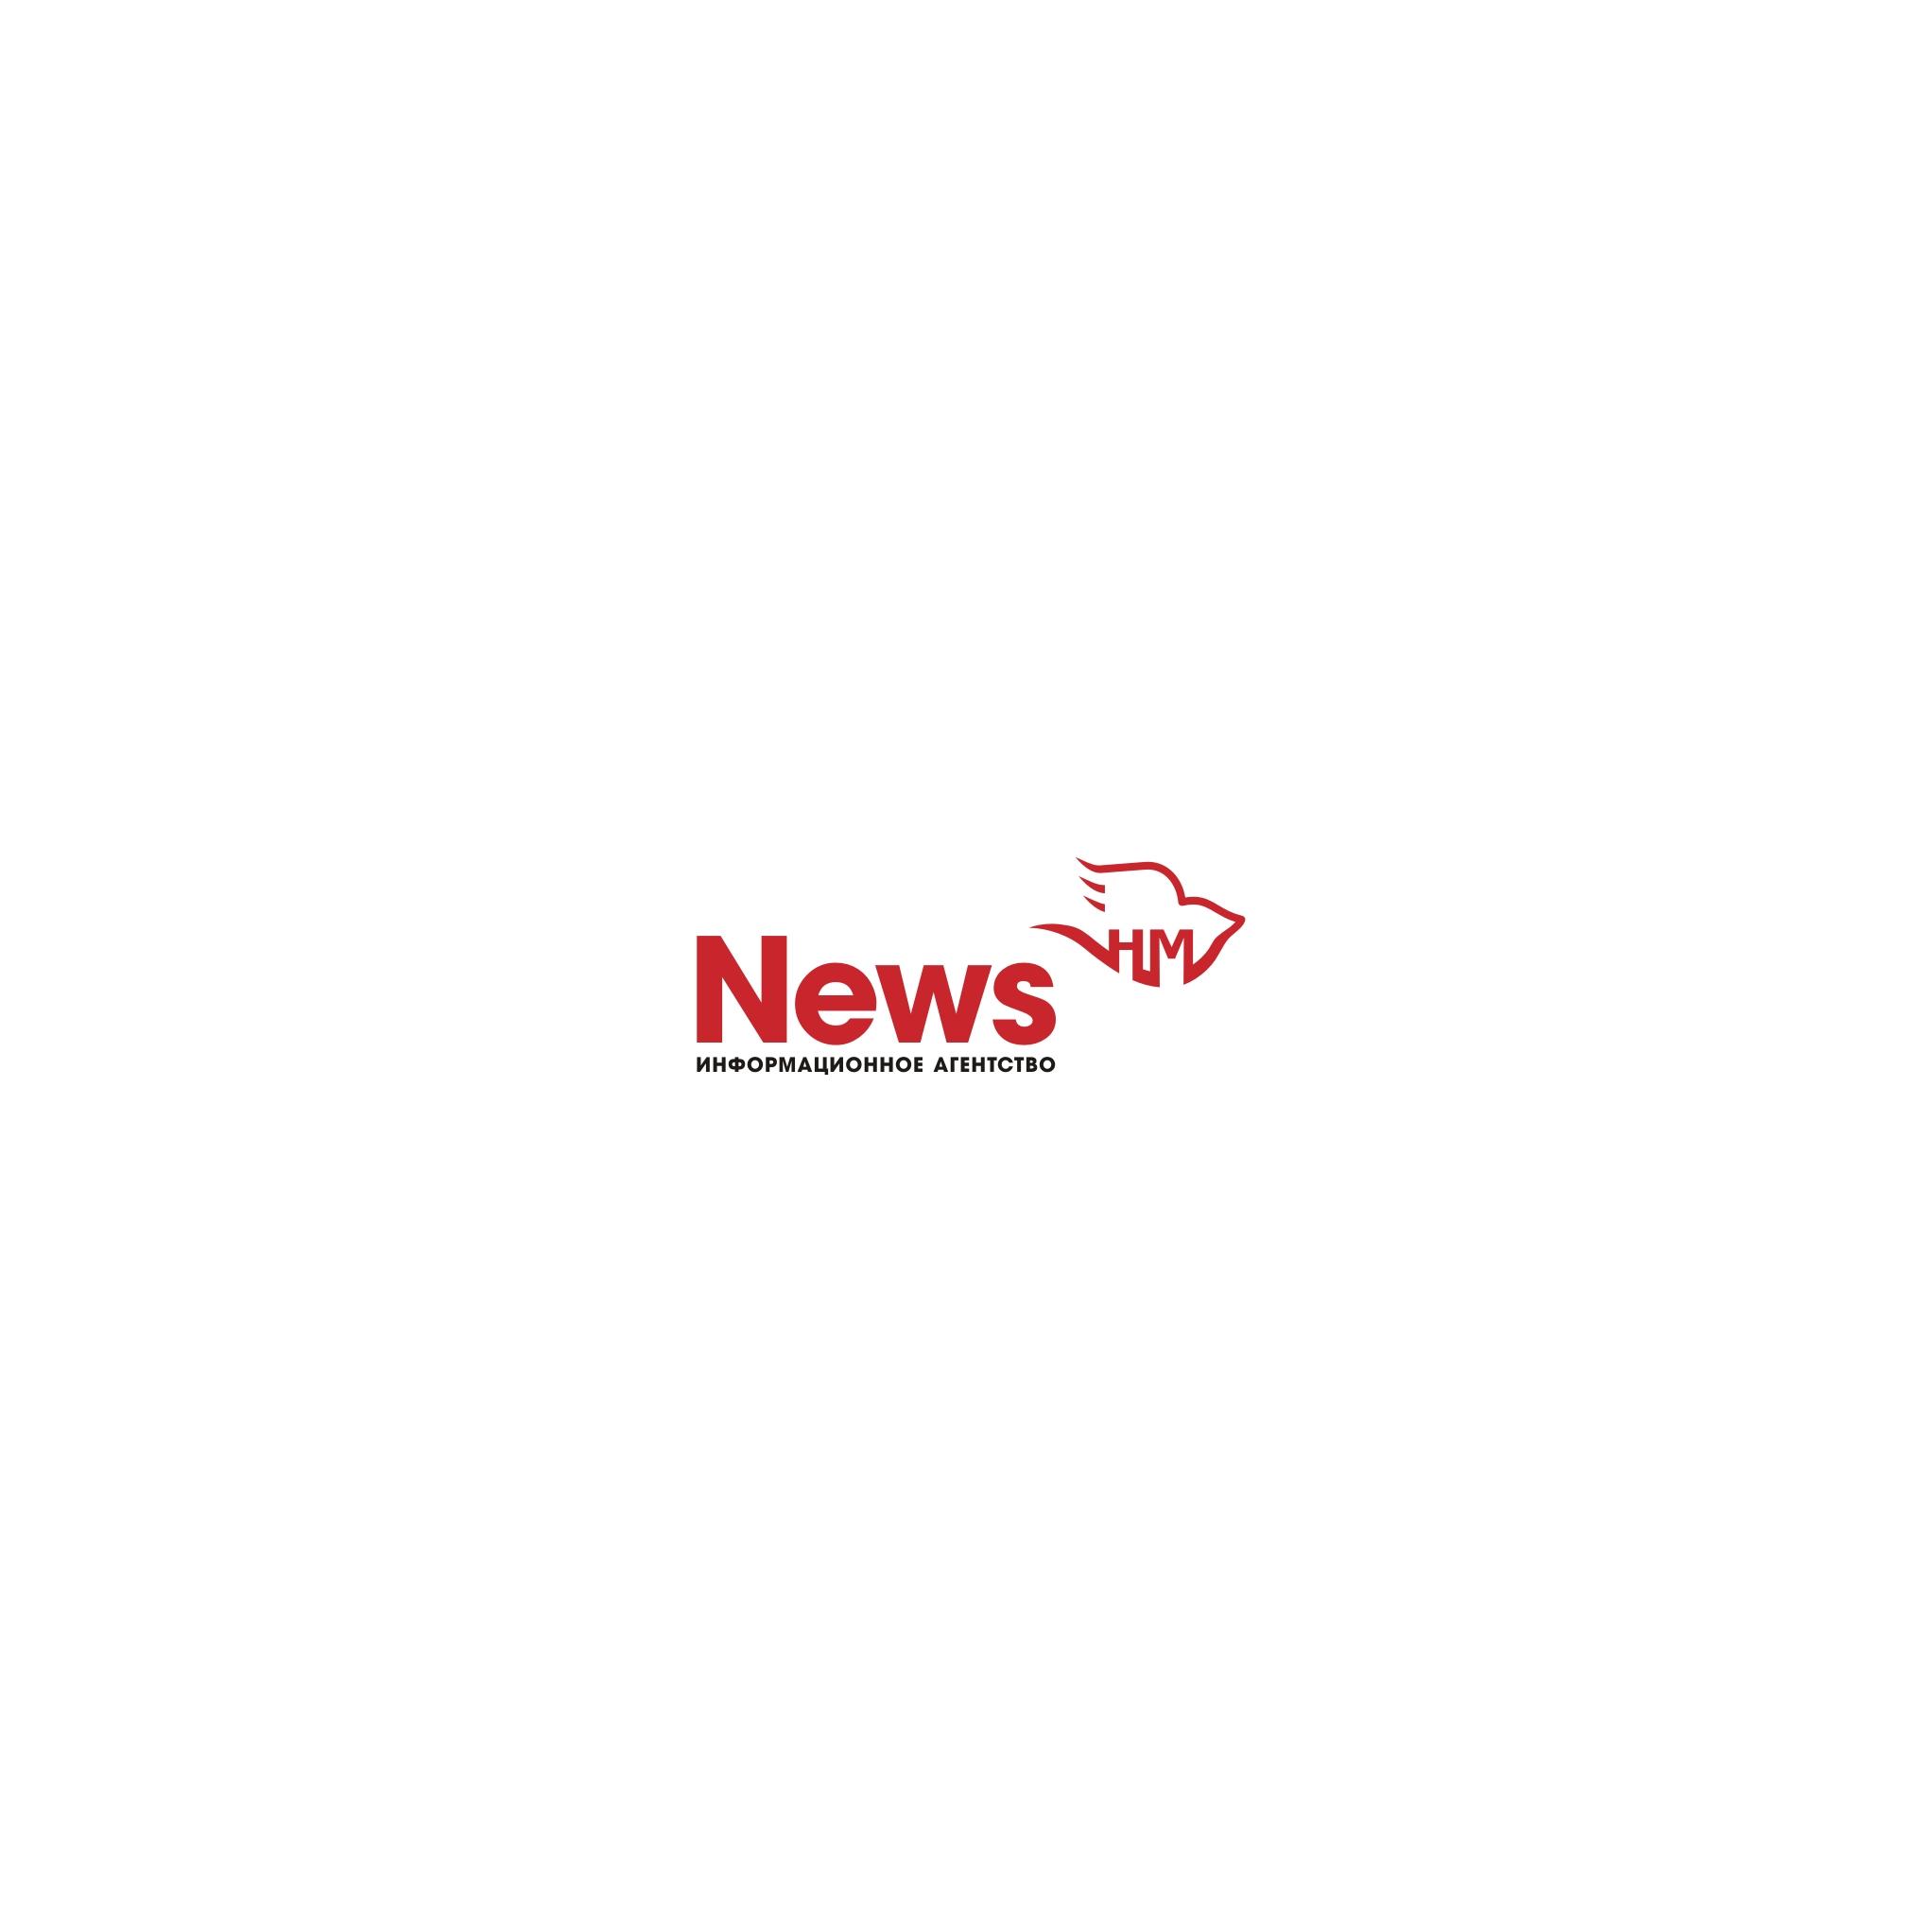 Логотип для информационного агентства фото f_1745aa65d7cba6e0.jpg